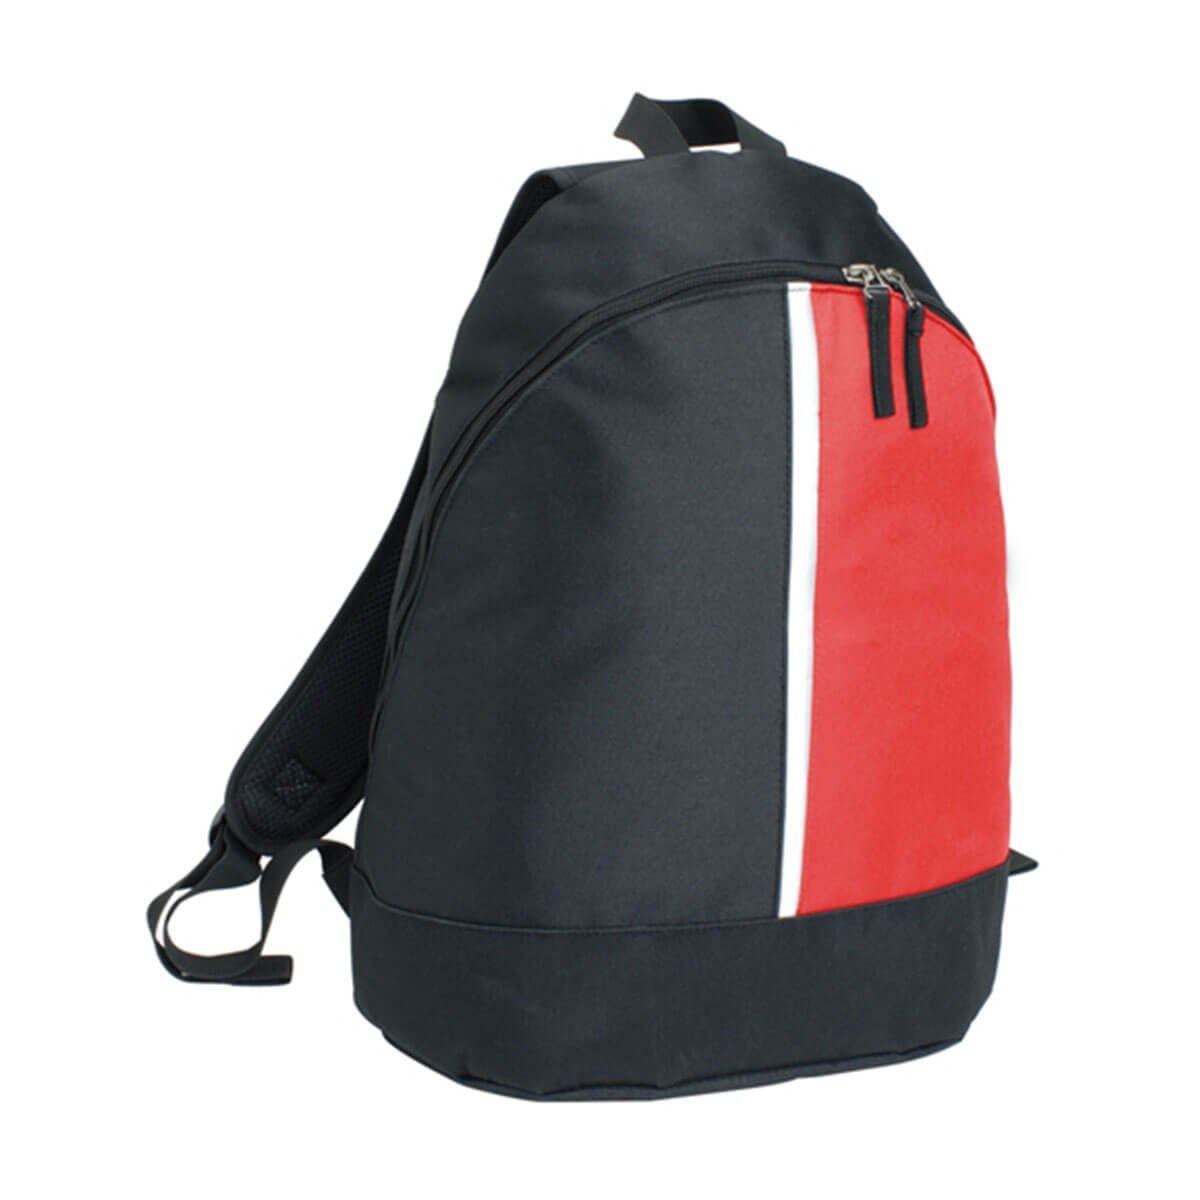 2-Panel Backpack-Black / Red